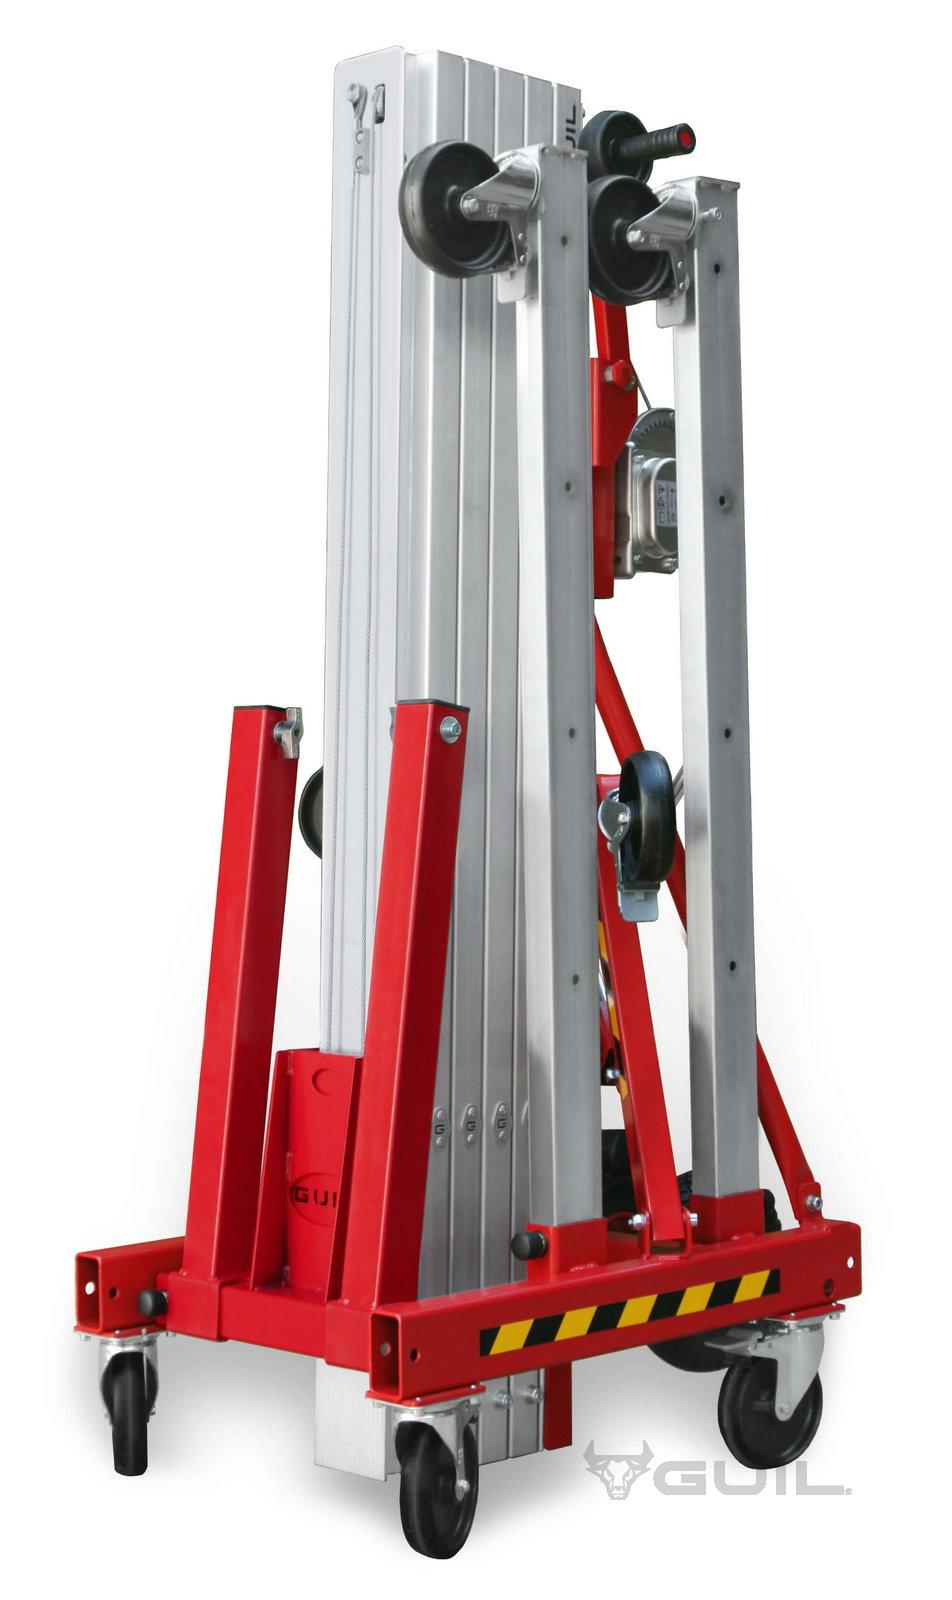 Kanaallift 6,30 m 220 kg (dutch) (2)